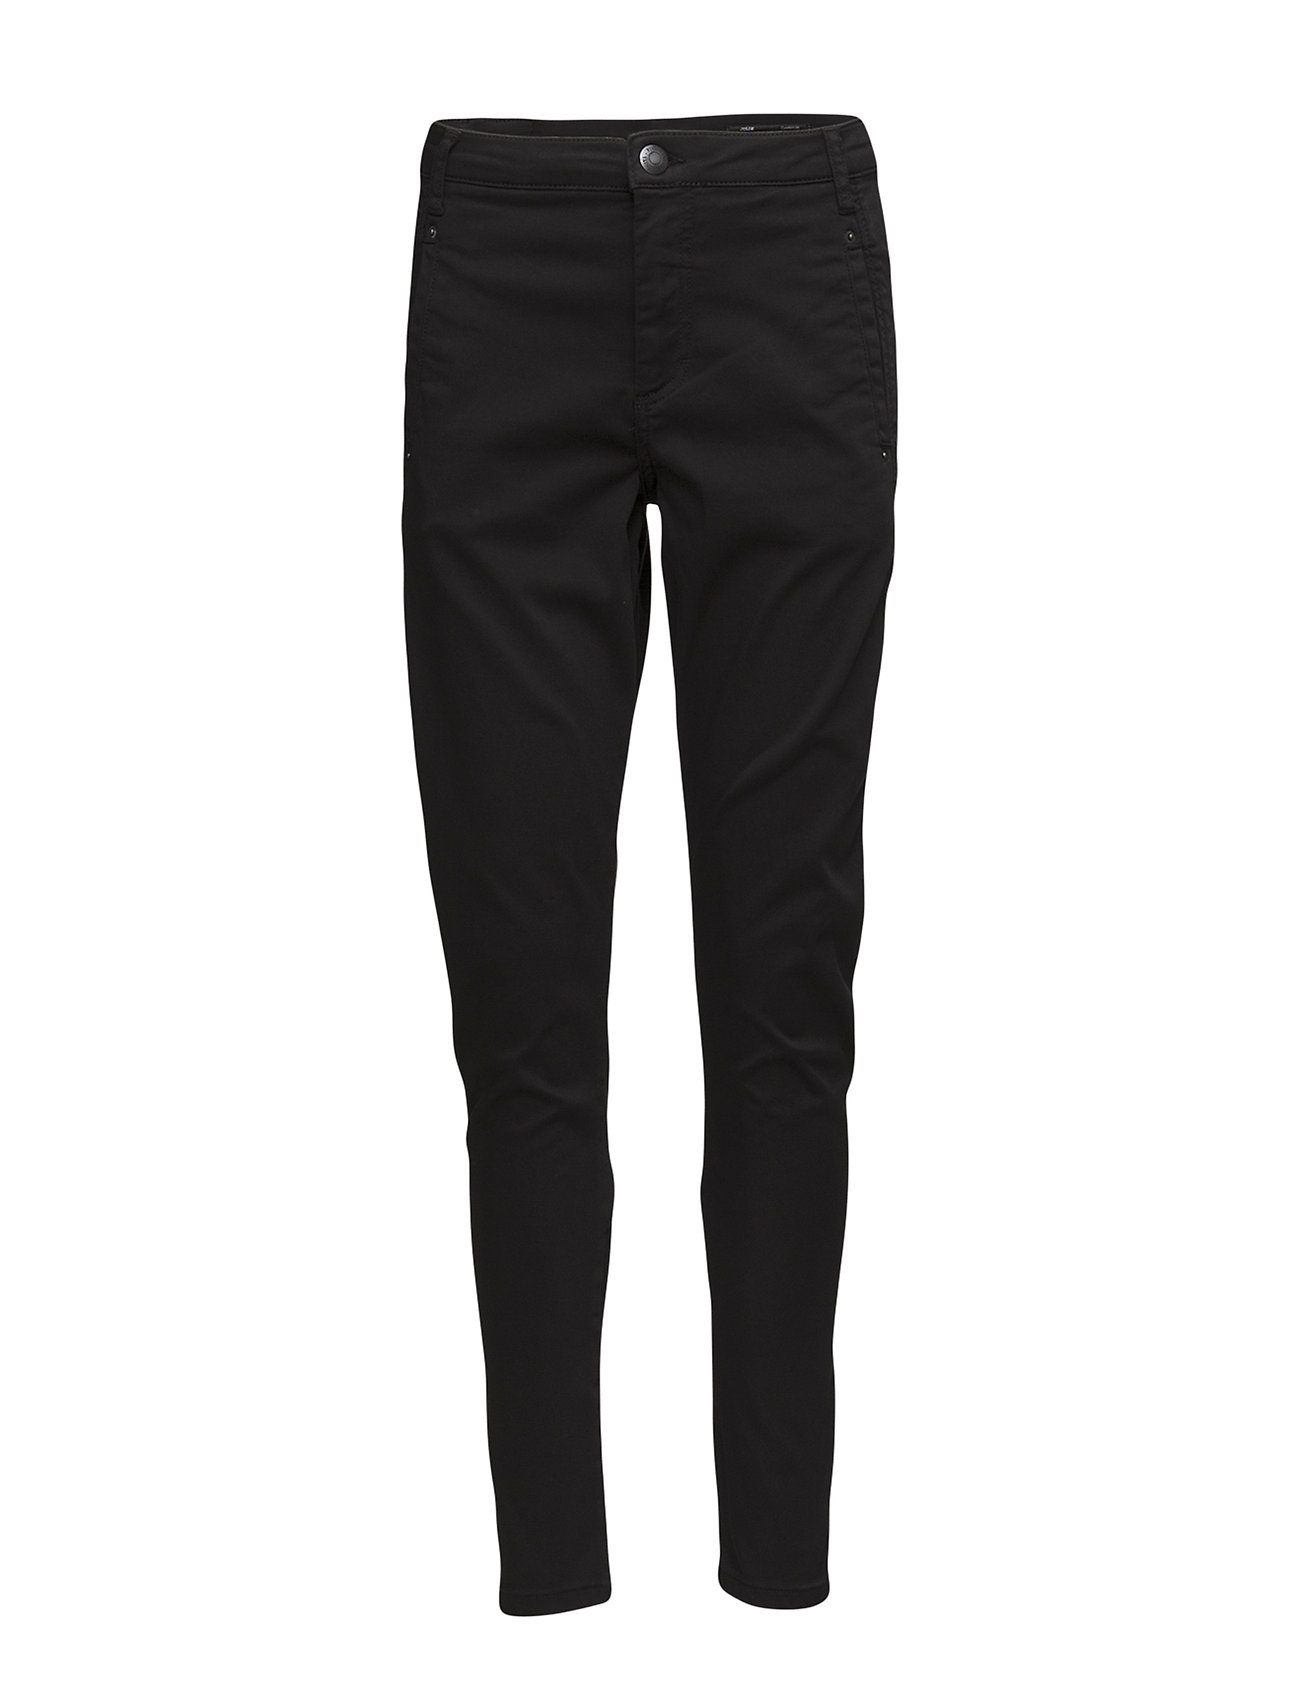 1d241b7bccb Jolie 606 Gun Black, Pants (Gun Black) (99.95 €) - FIVEUNITS ...